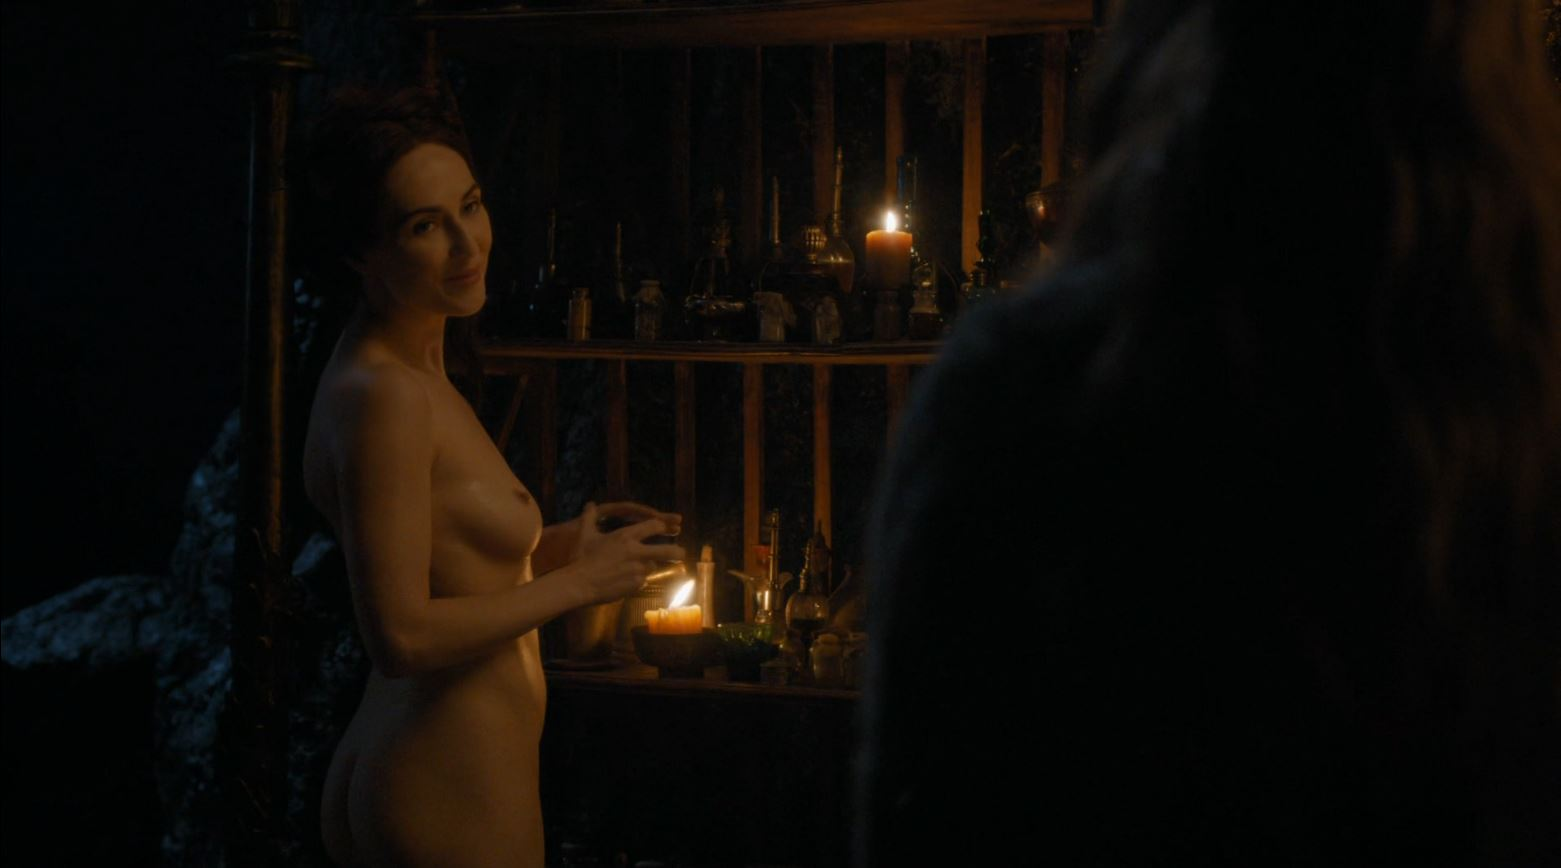 Game Of Thrones S4Ep7 Mockingbird Review - Carice van Houten nude as Melisandre